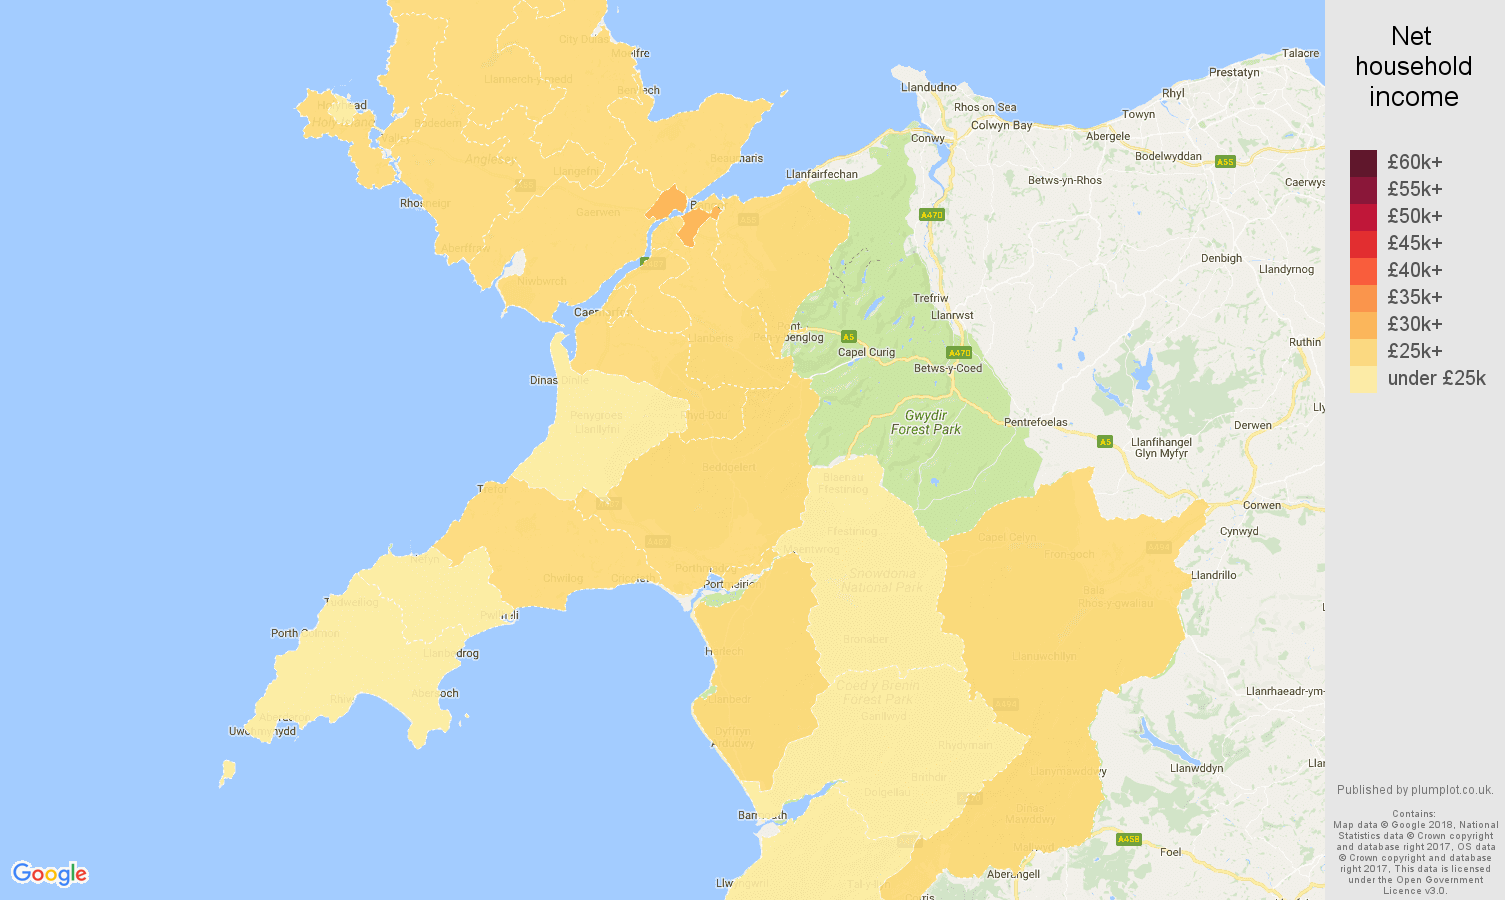 Gwynedd net household income map